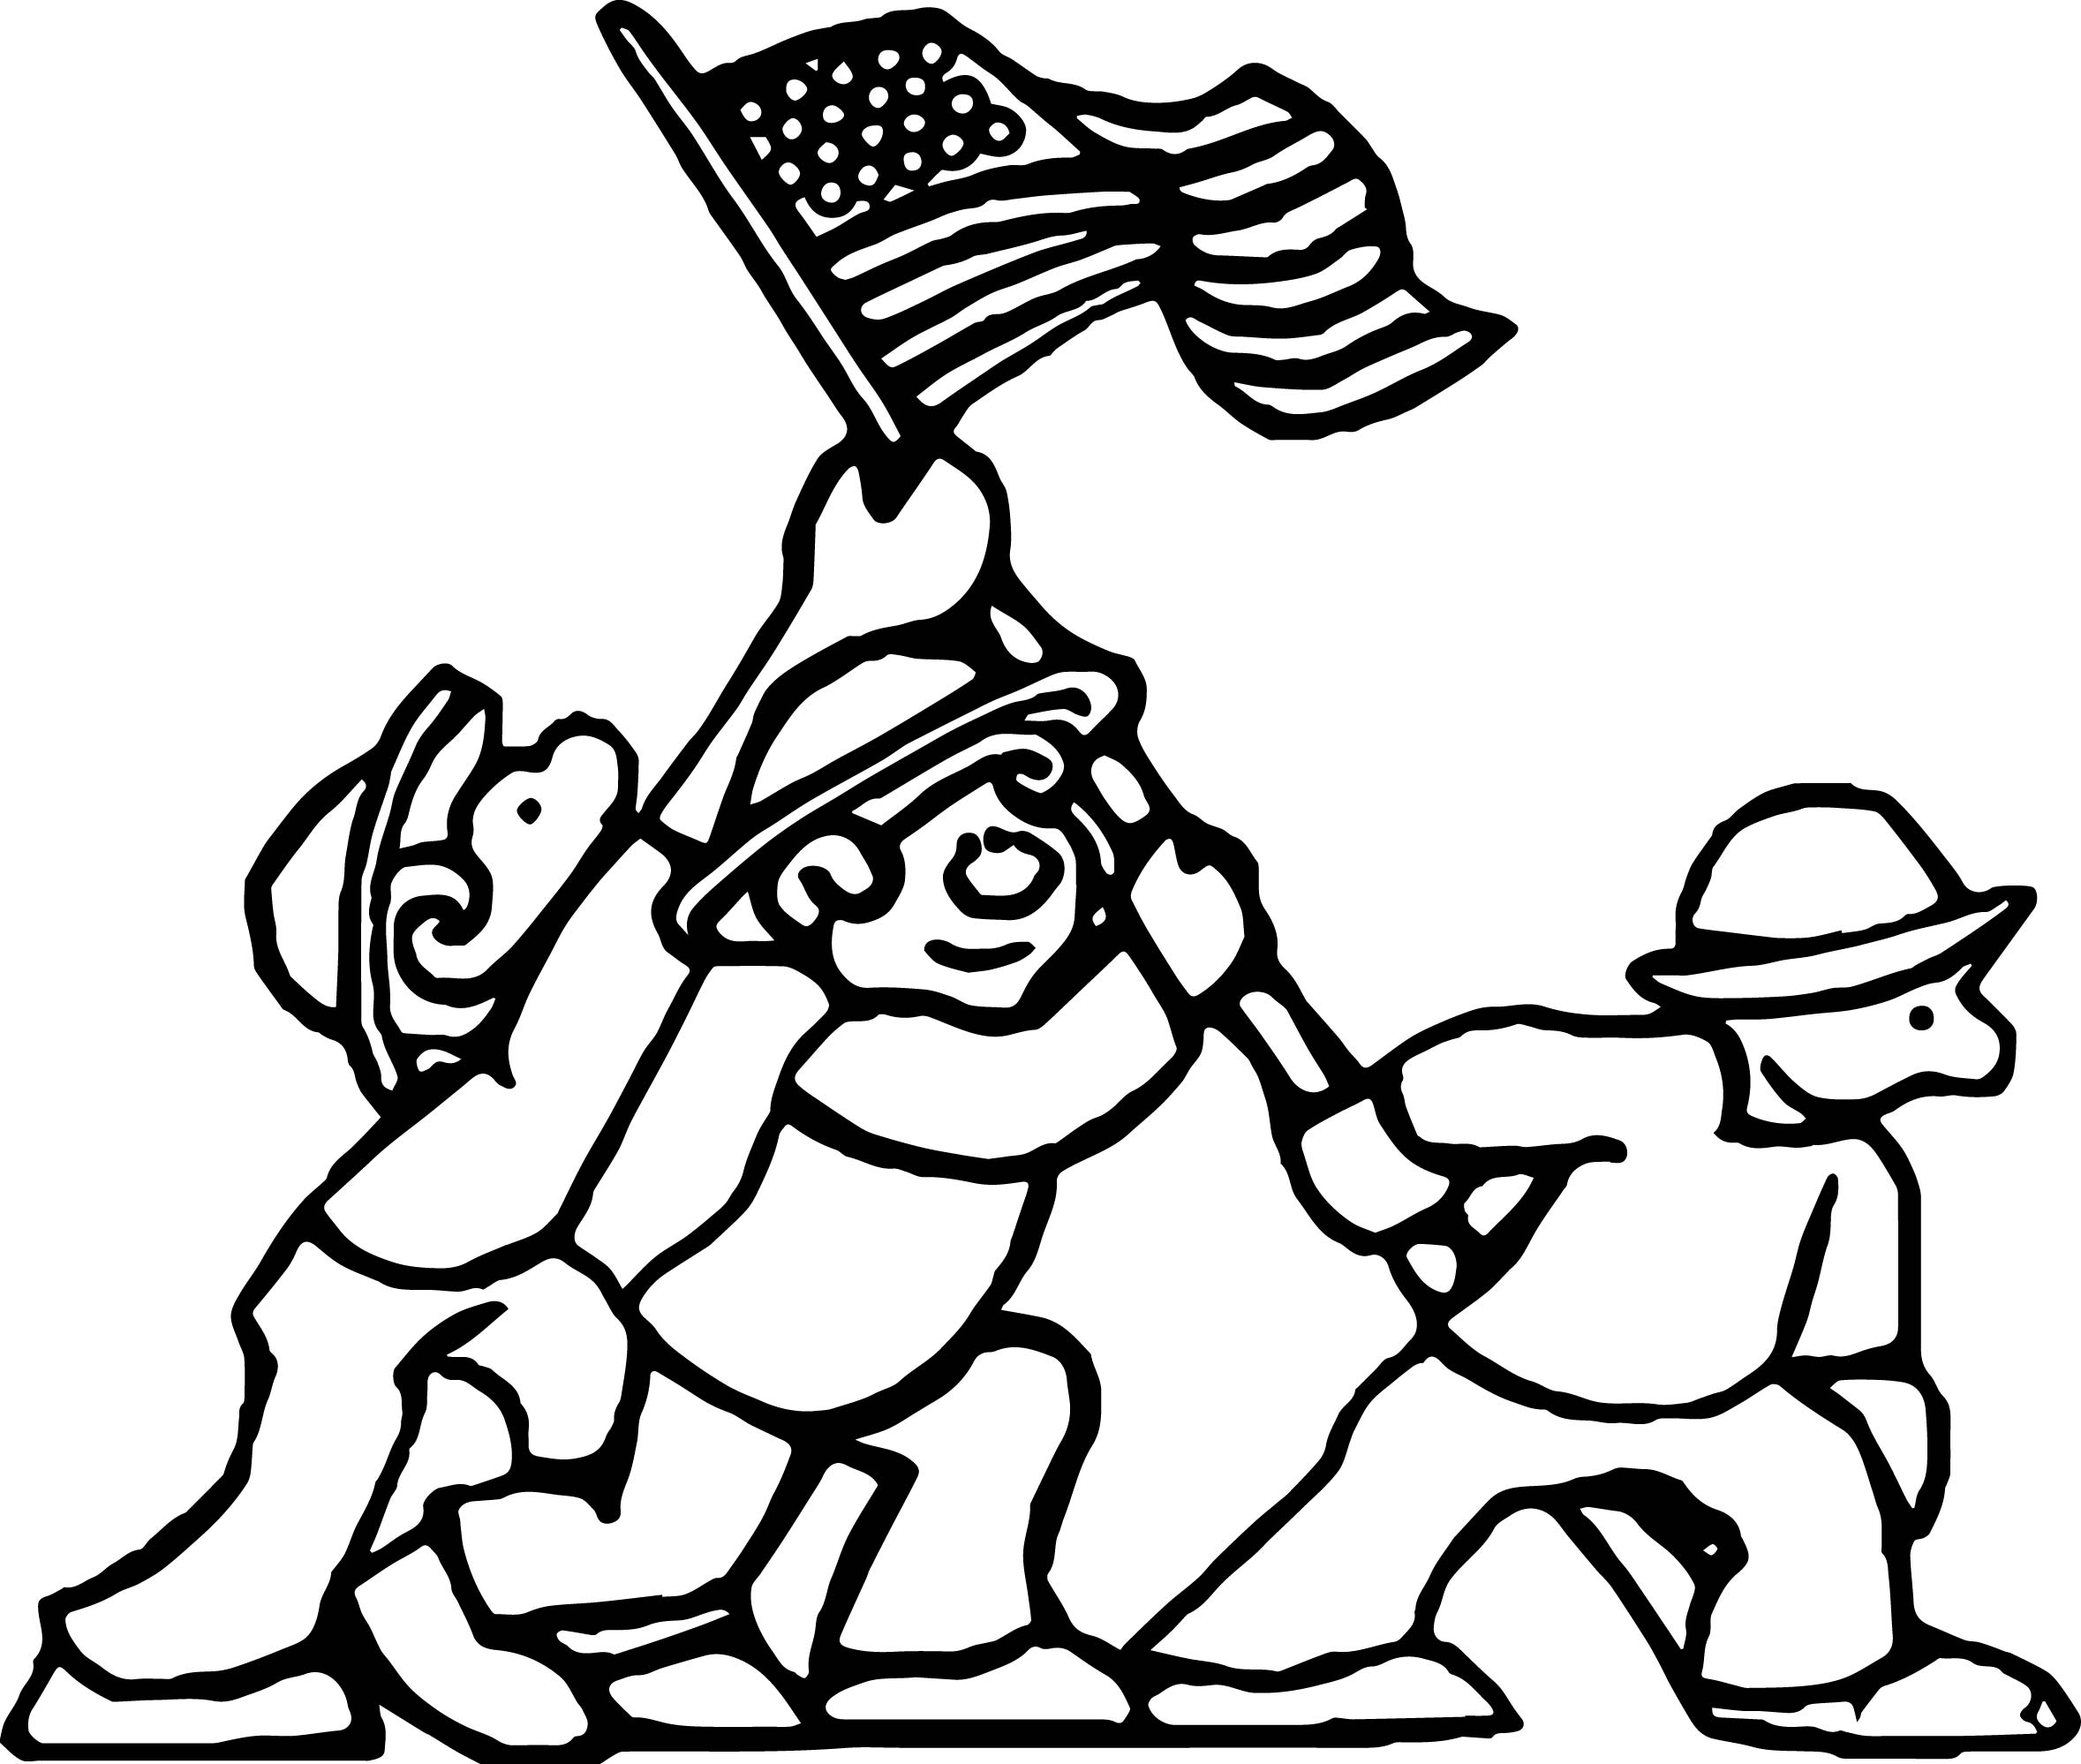 American Revolution American Wars Coloring Page